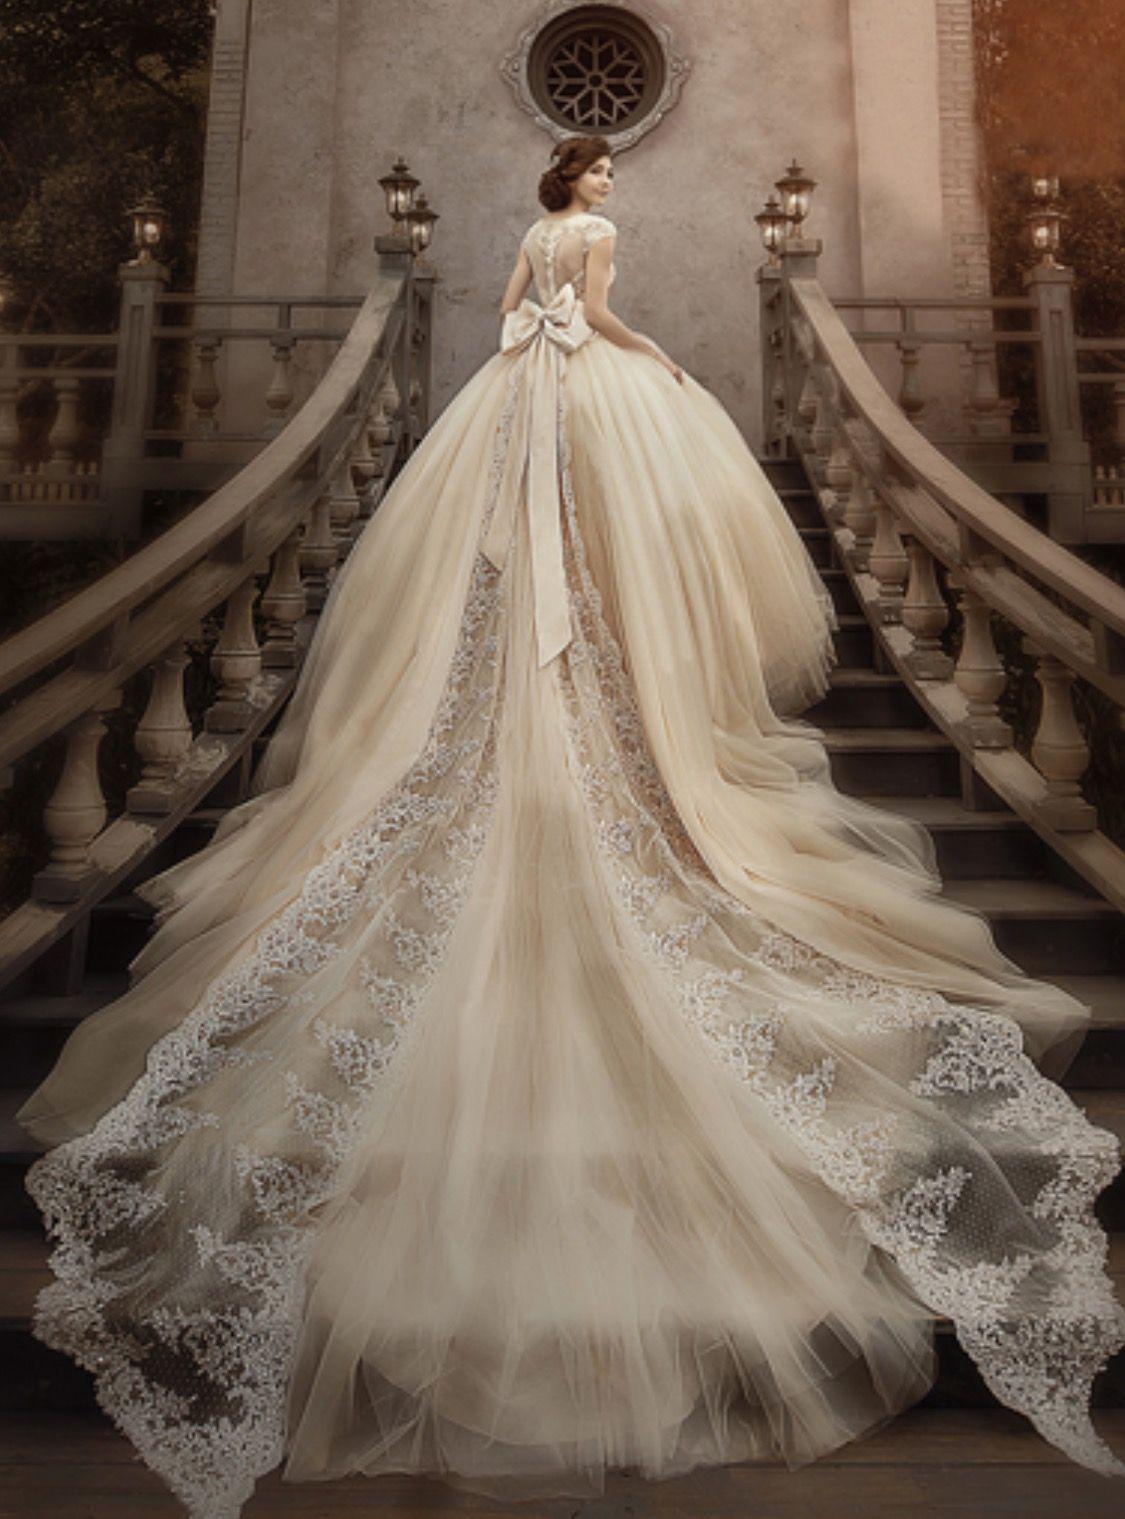 Pin by Brittany Larsen on Dream Dress Pinterest Wedding dress